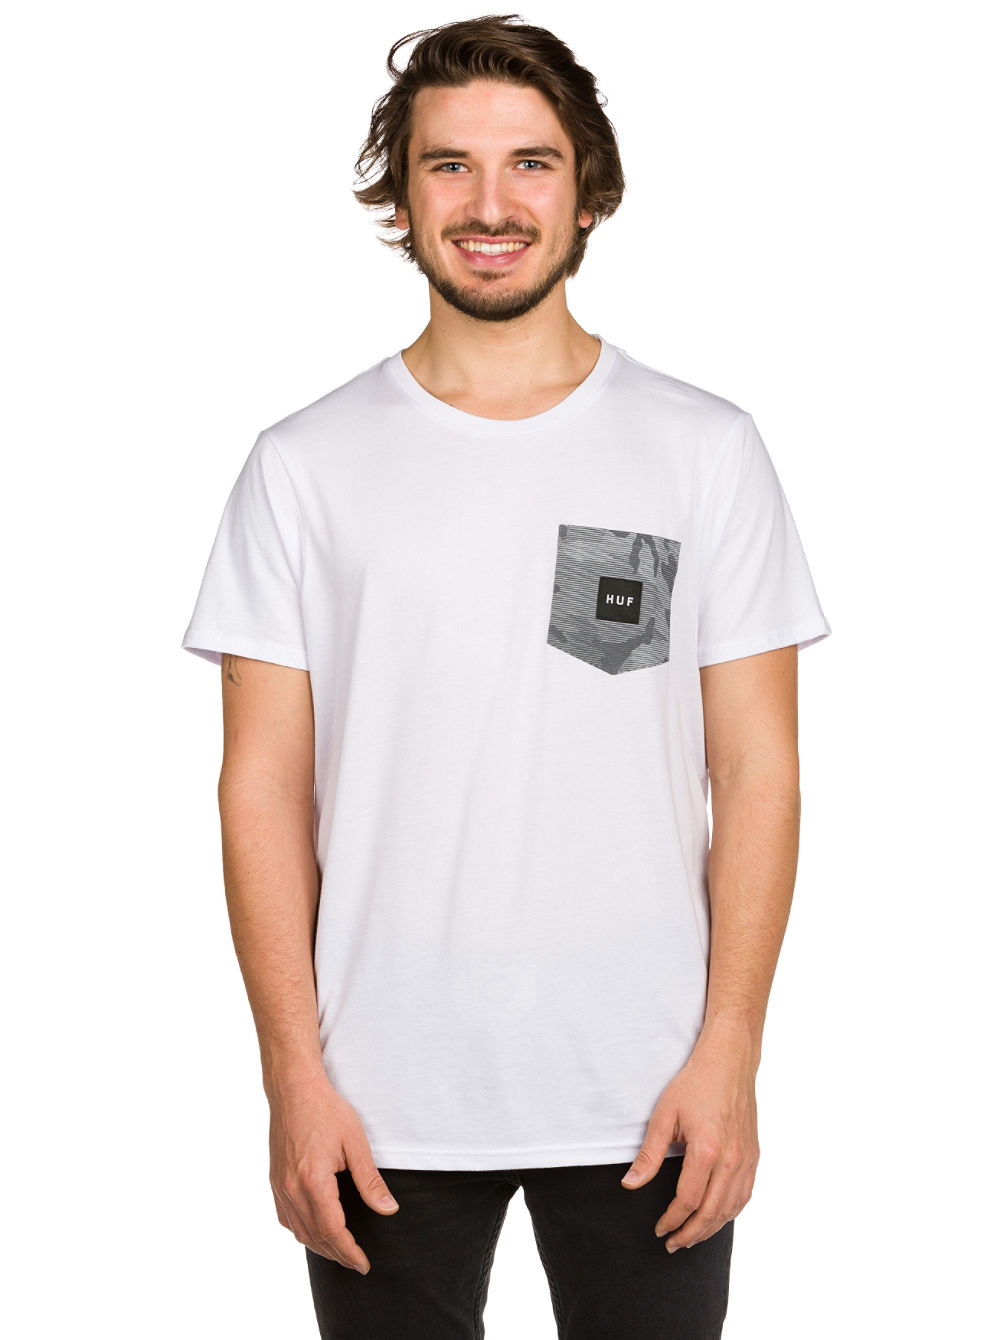 huf-street-ops-camo-pocket-t-shirt